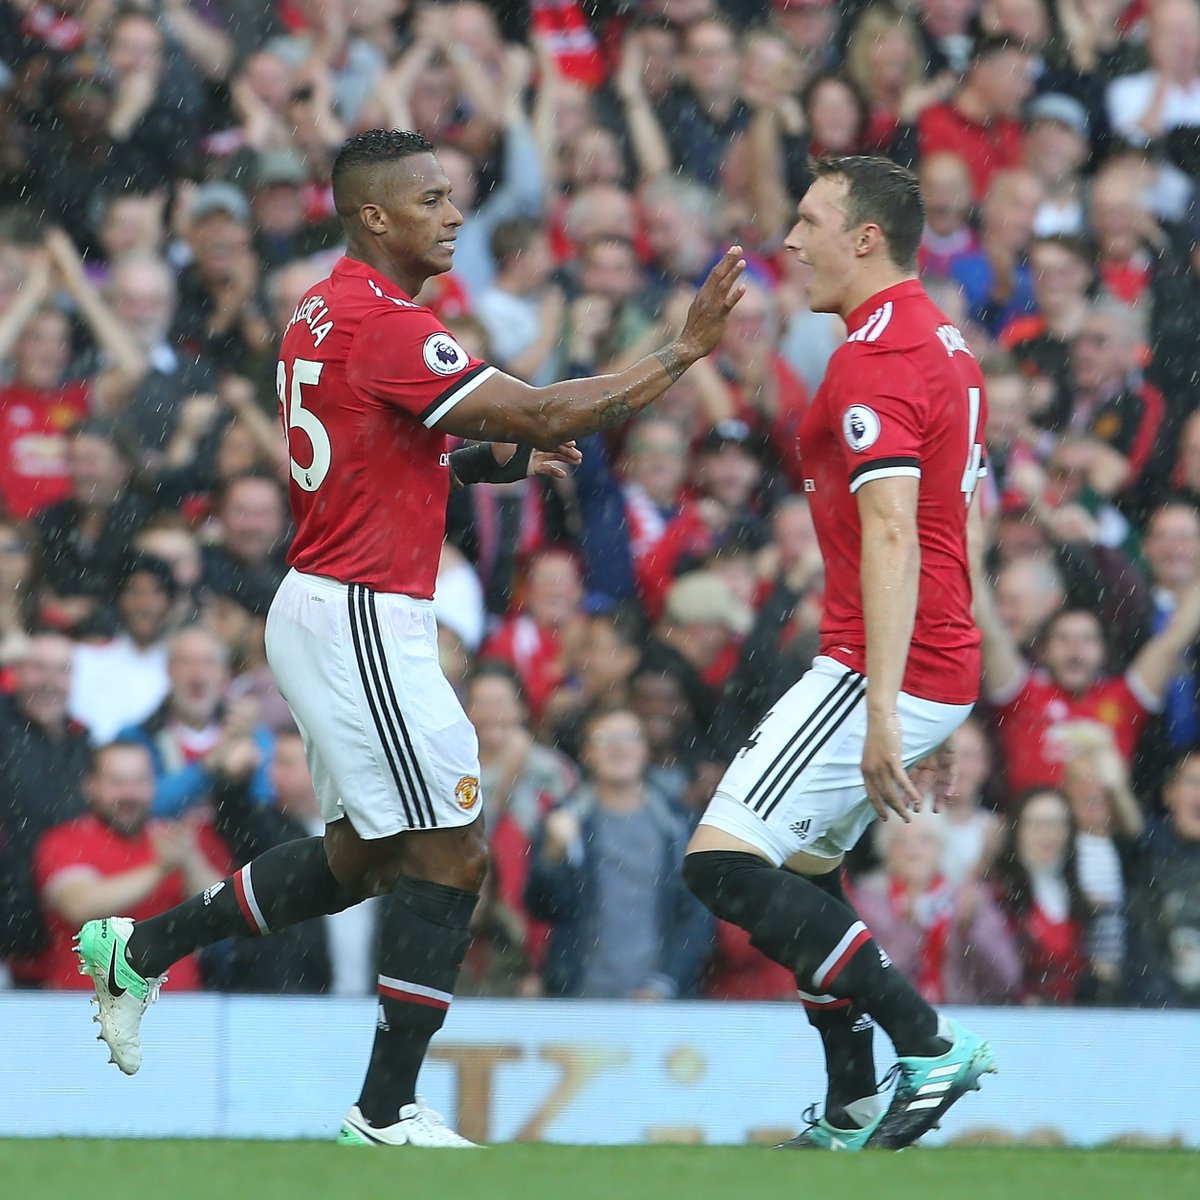 Take a bow, @Anto_V25 😳👏  #MUFC #GoalOfTheDay